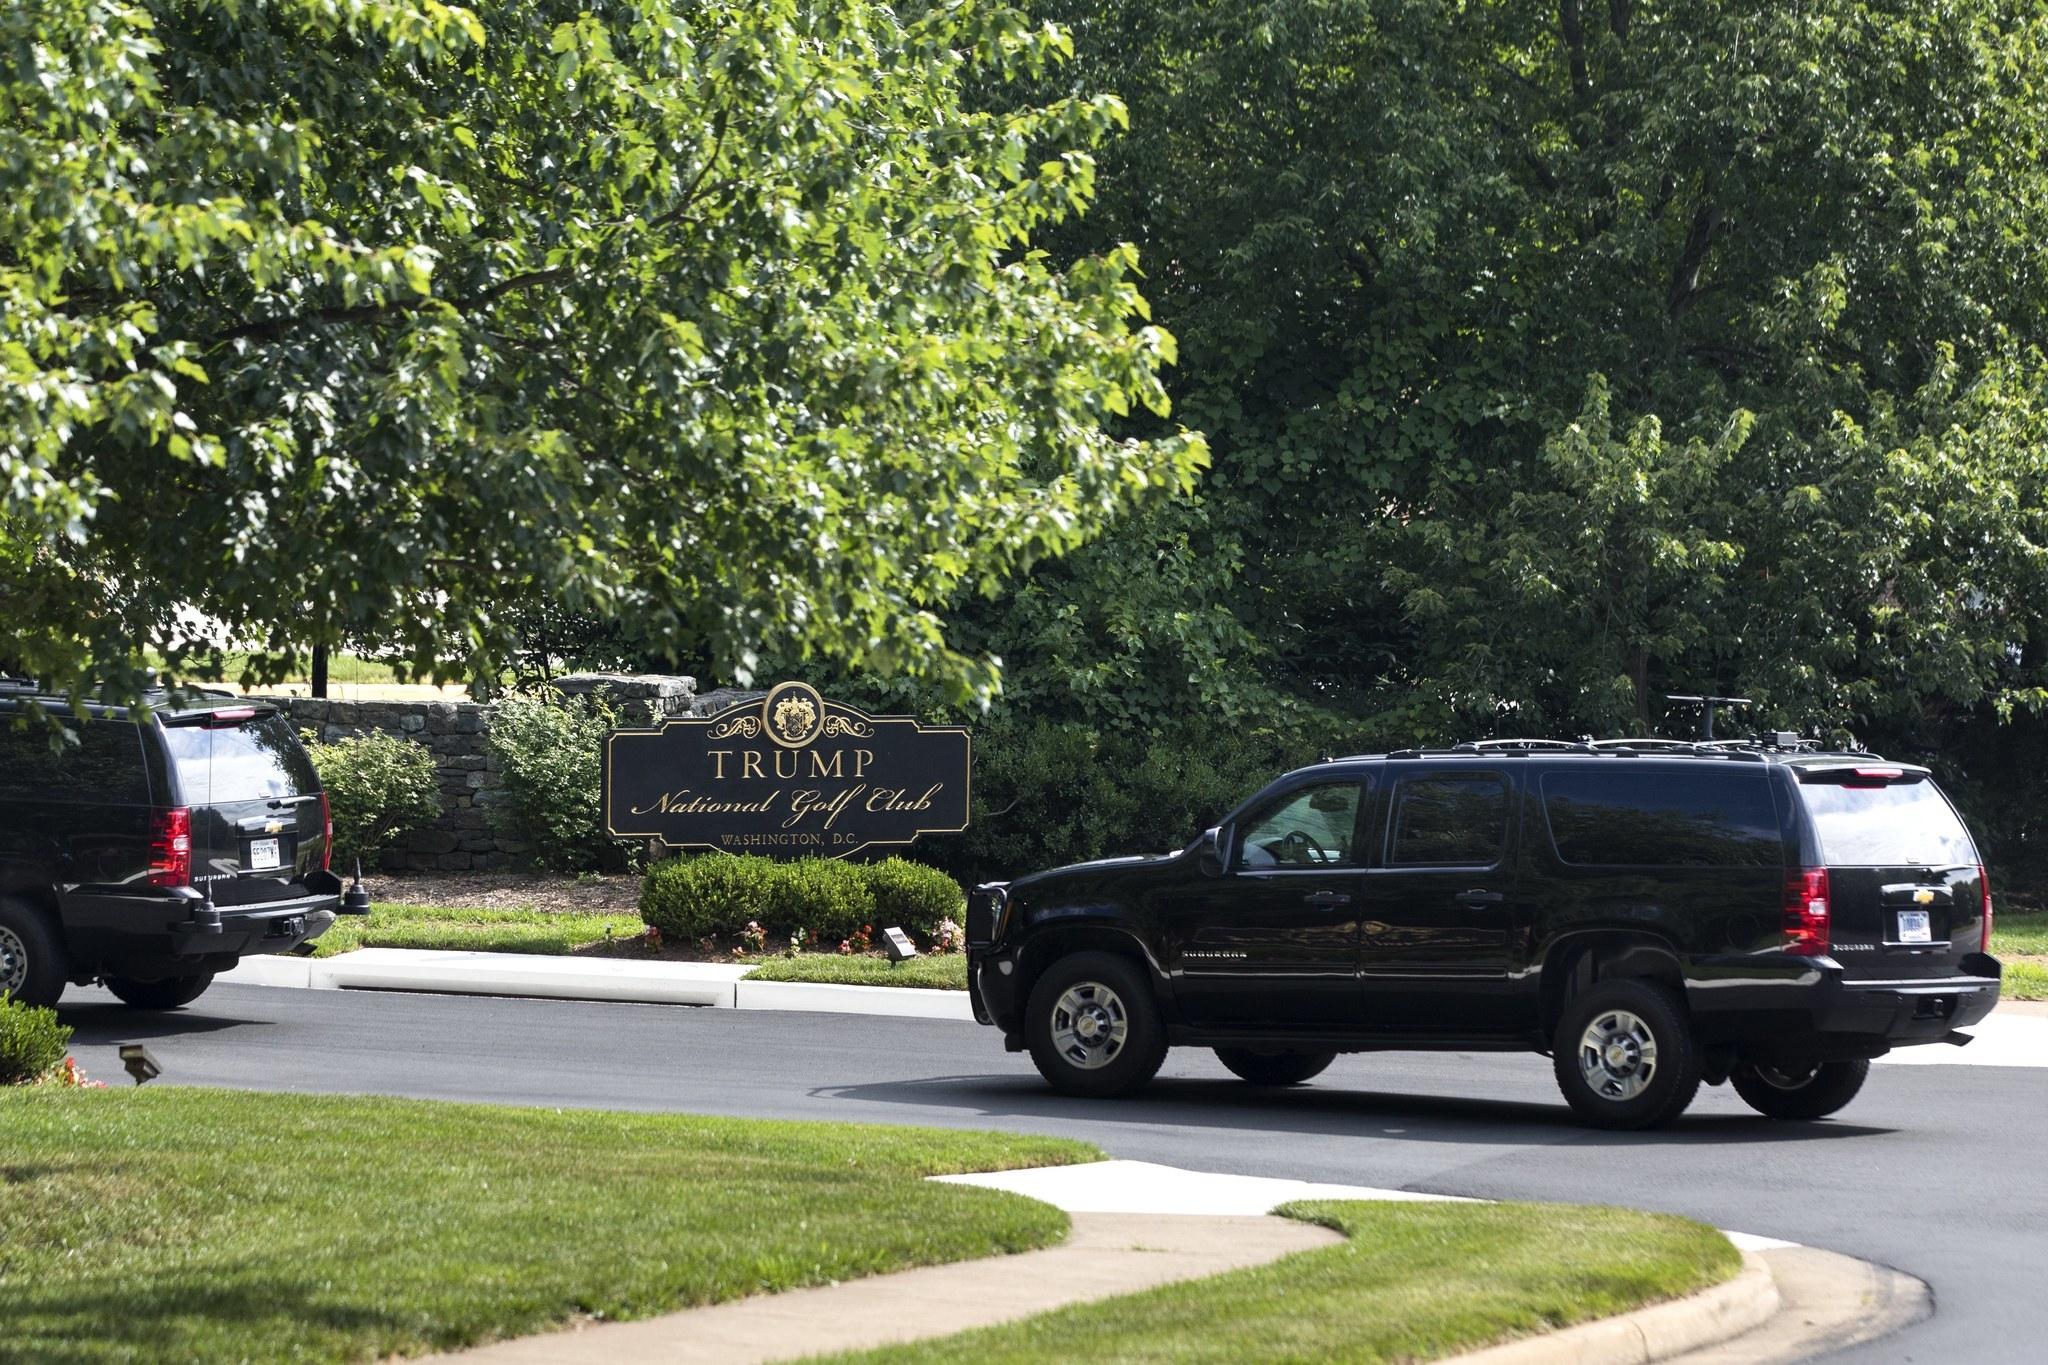 President Trump's motorcade arrives at the Trump National Golf Club in Sterling, Va., on June 25, 2017. (Jim Lo Scalzo / European Pressphoto Agency)